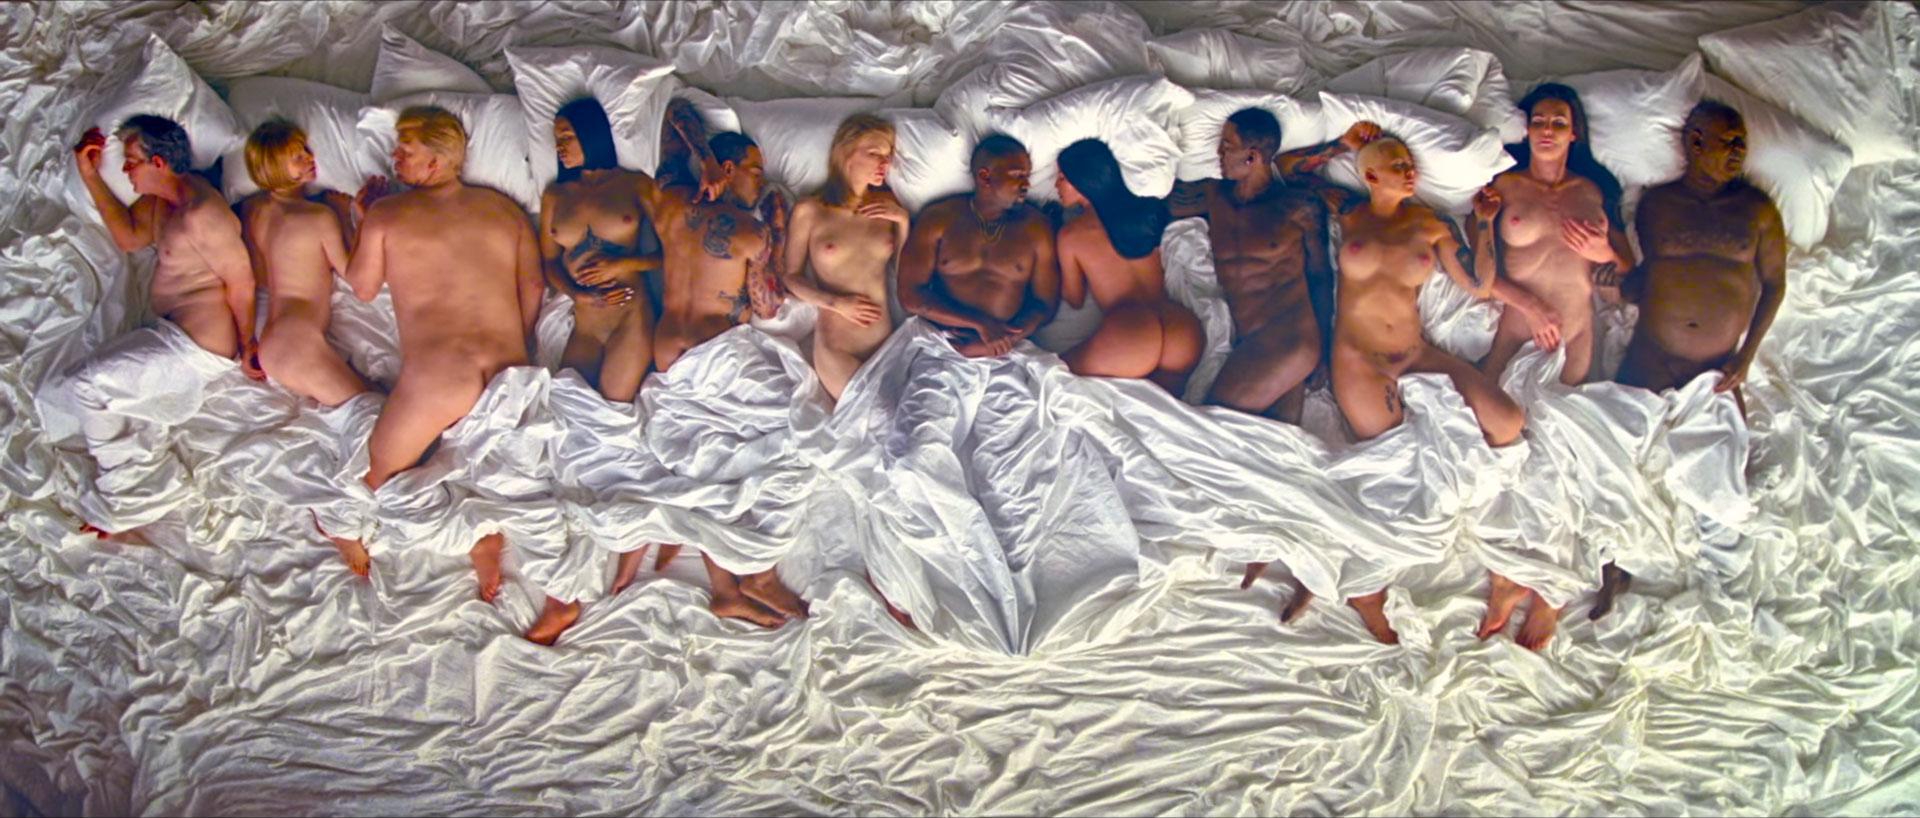 Desiderio Kanye